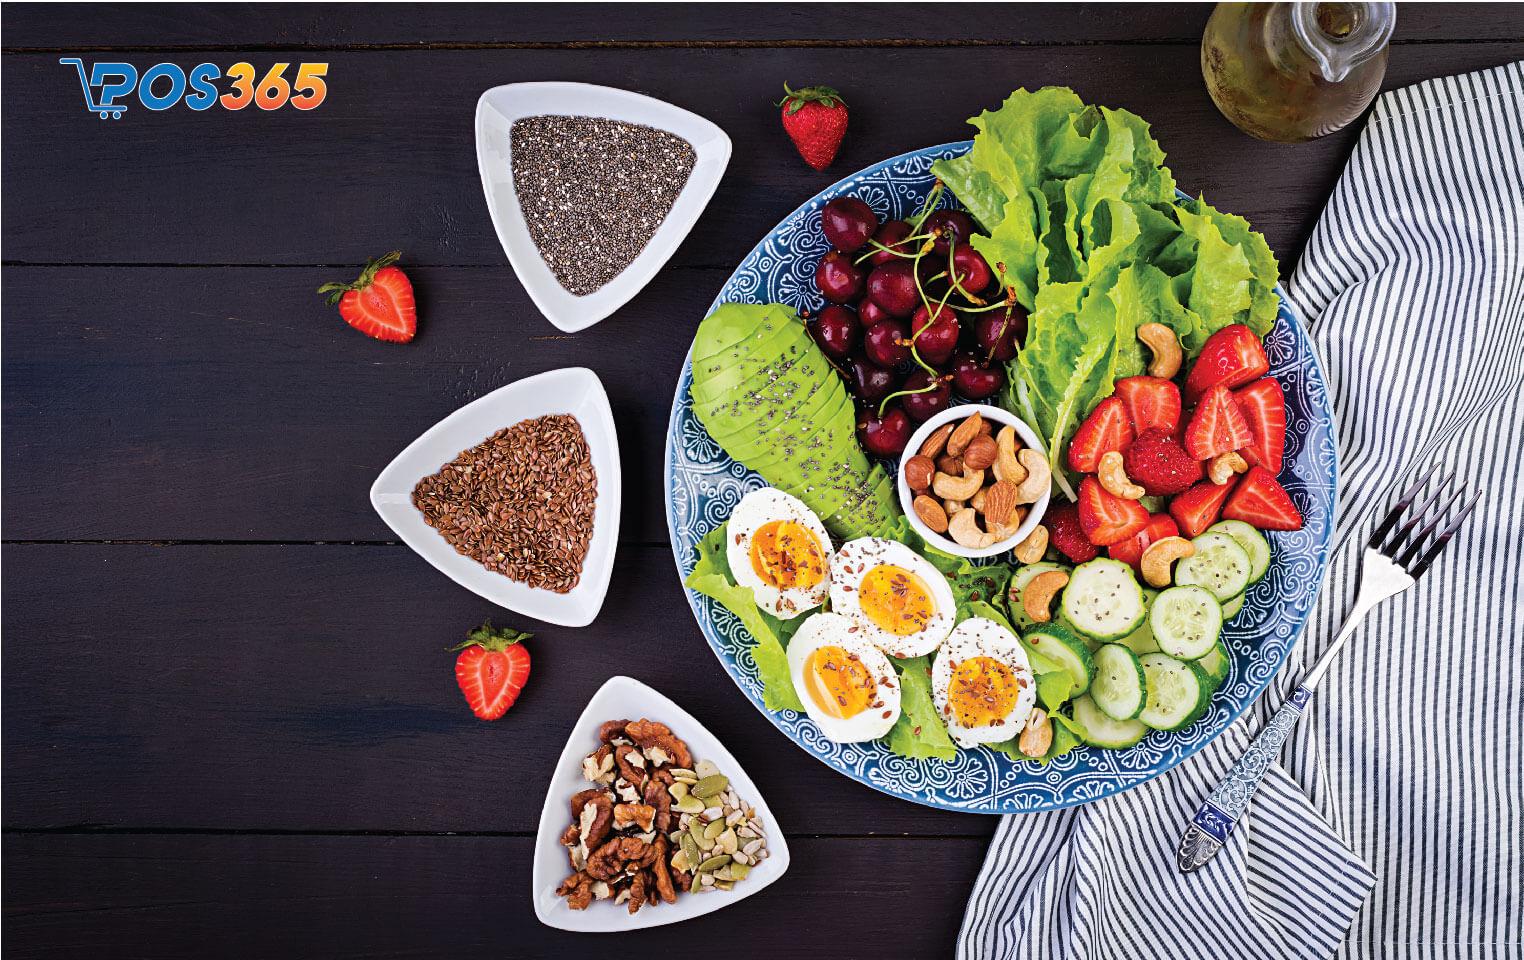 món ăn keto giảm cân